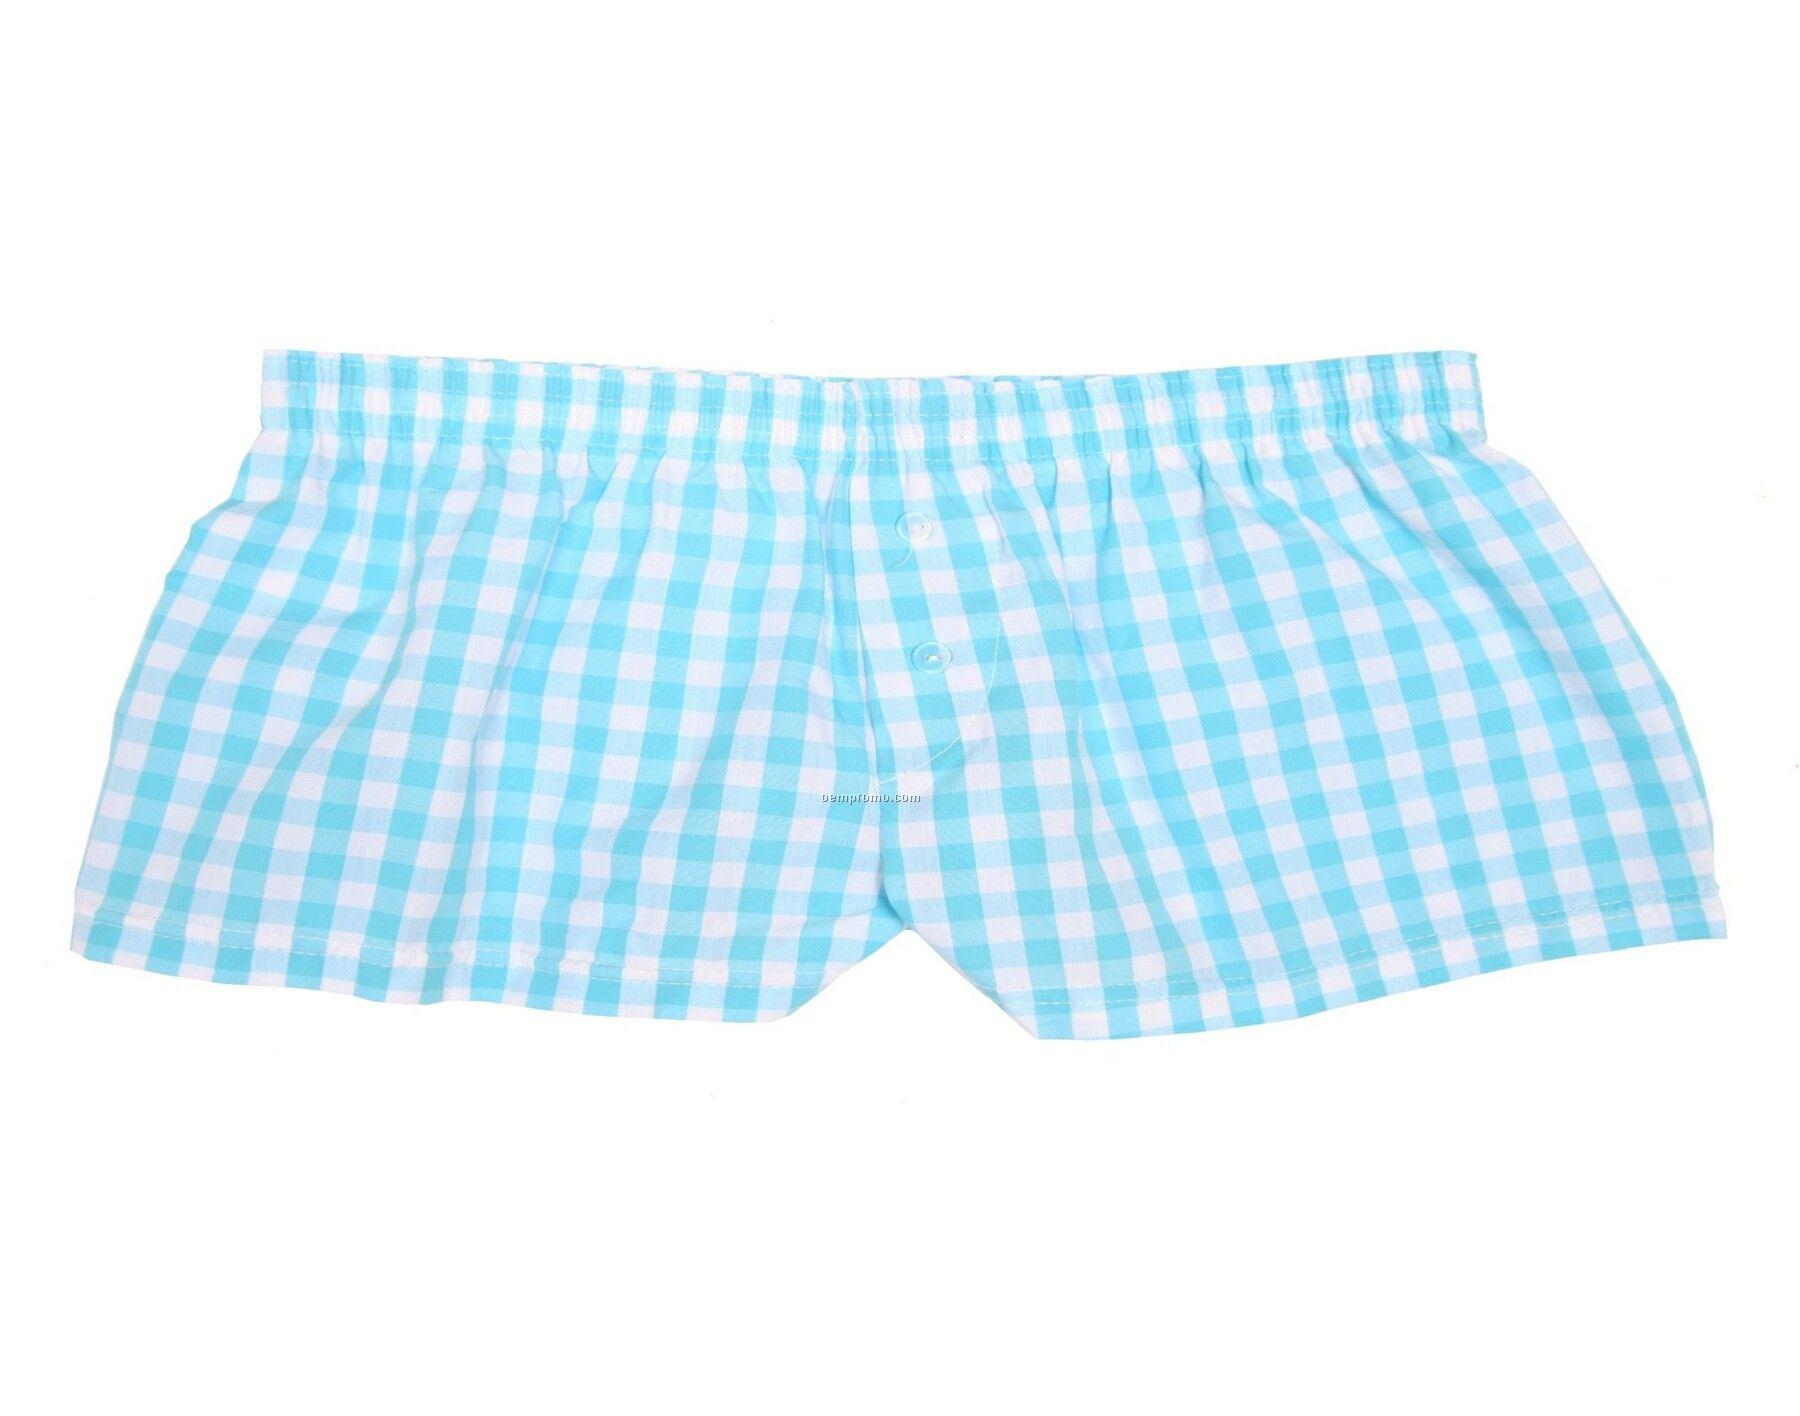 Ladies' Poolside Blue Bitty Boxer Short